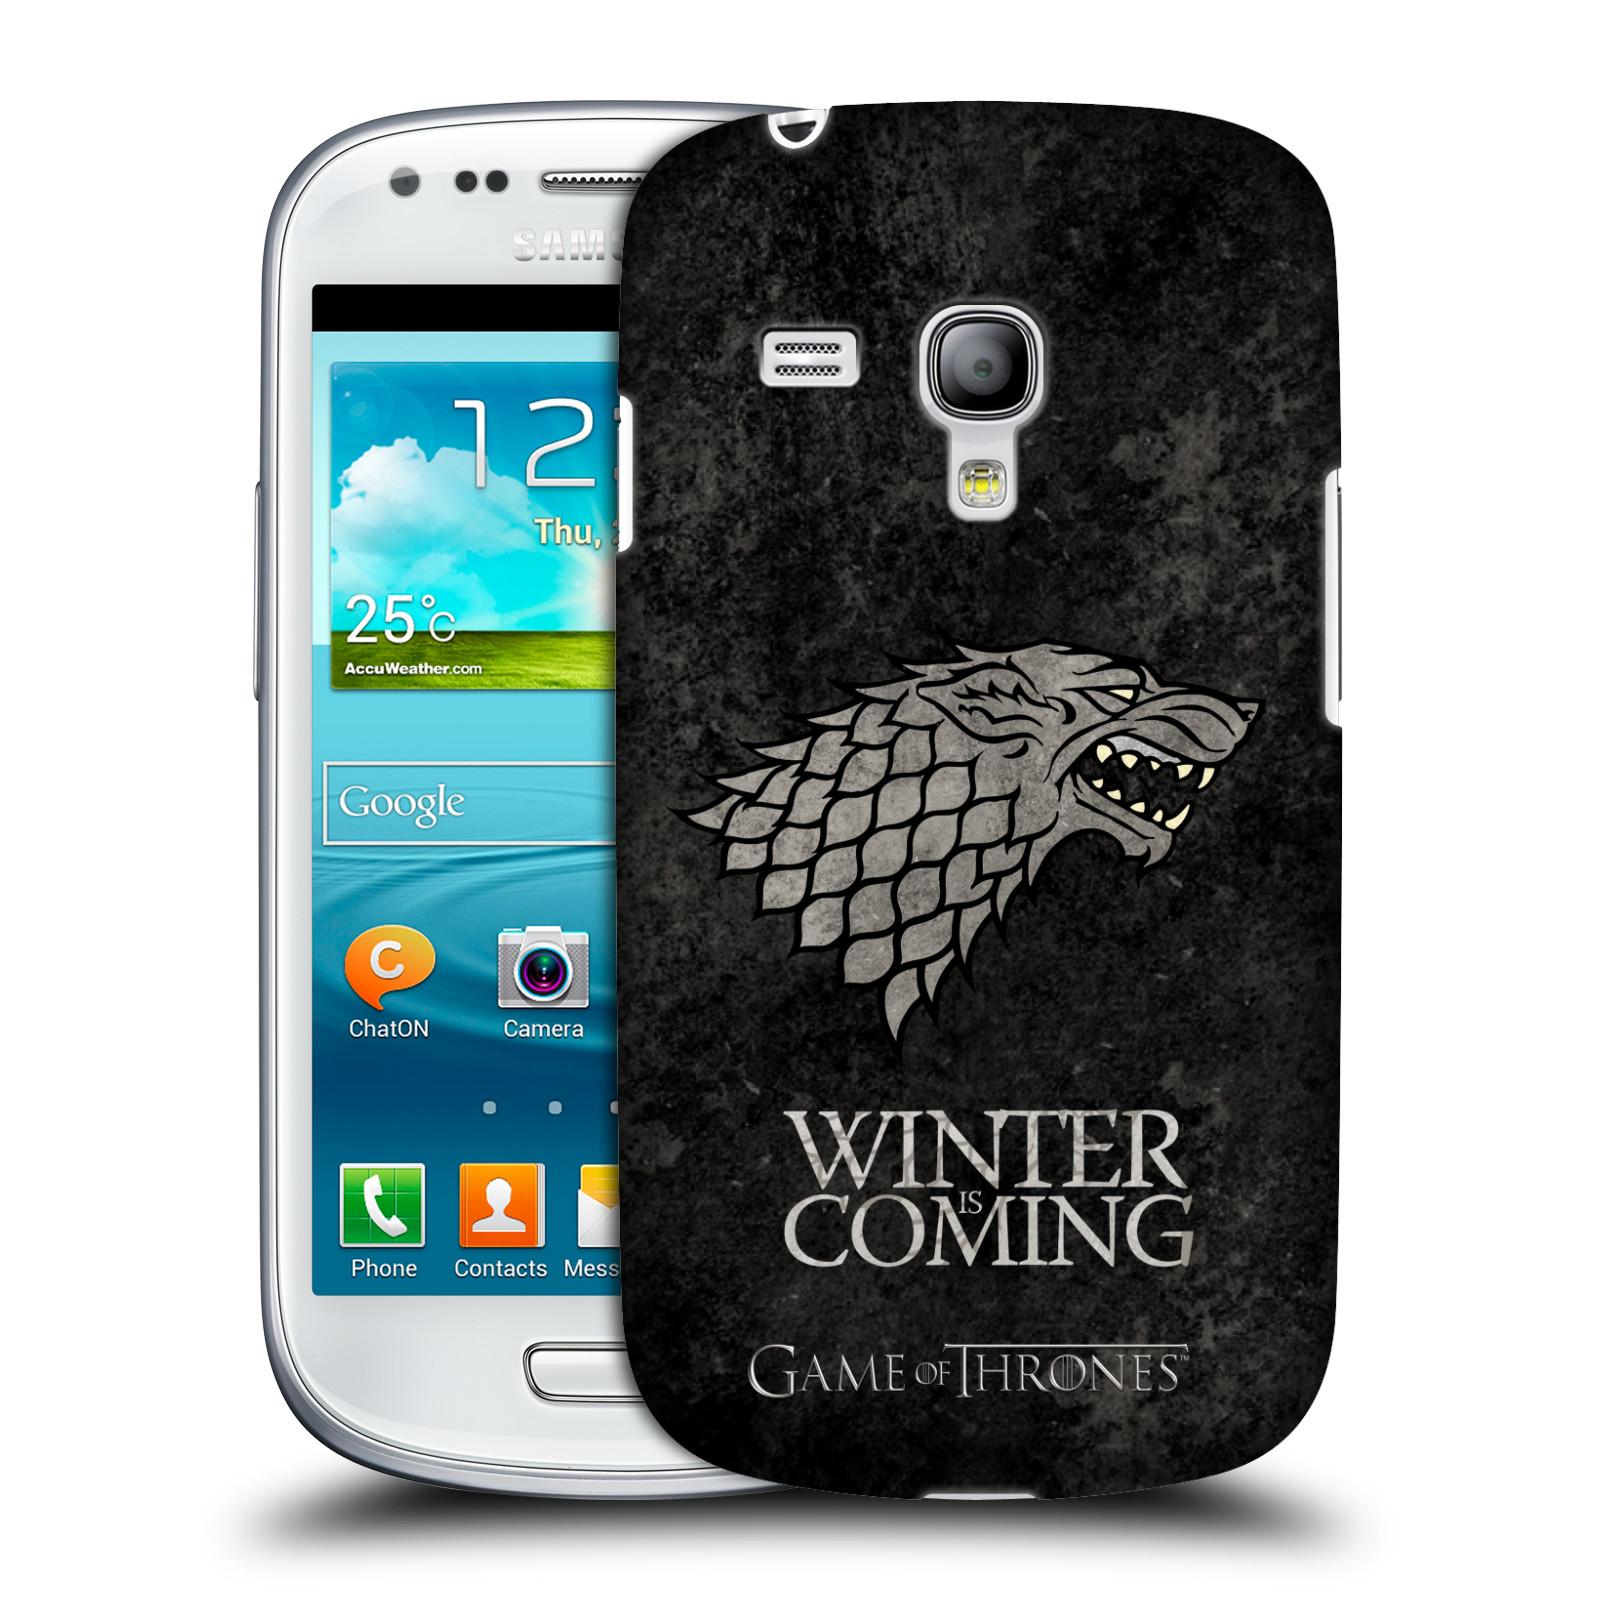 Plastové pouzdro na mobil Samsung Galaxy S III Mini VE HEAD CASE Hra o trůny - Stark - Winter is coming (Kryt či obal na mobilní telefon s licencovaným motivem Hra o trůny / Game Of Thrones pro Samsung Galaxy S3 Mini VE GT-i8200)